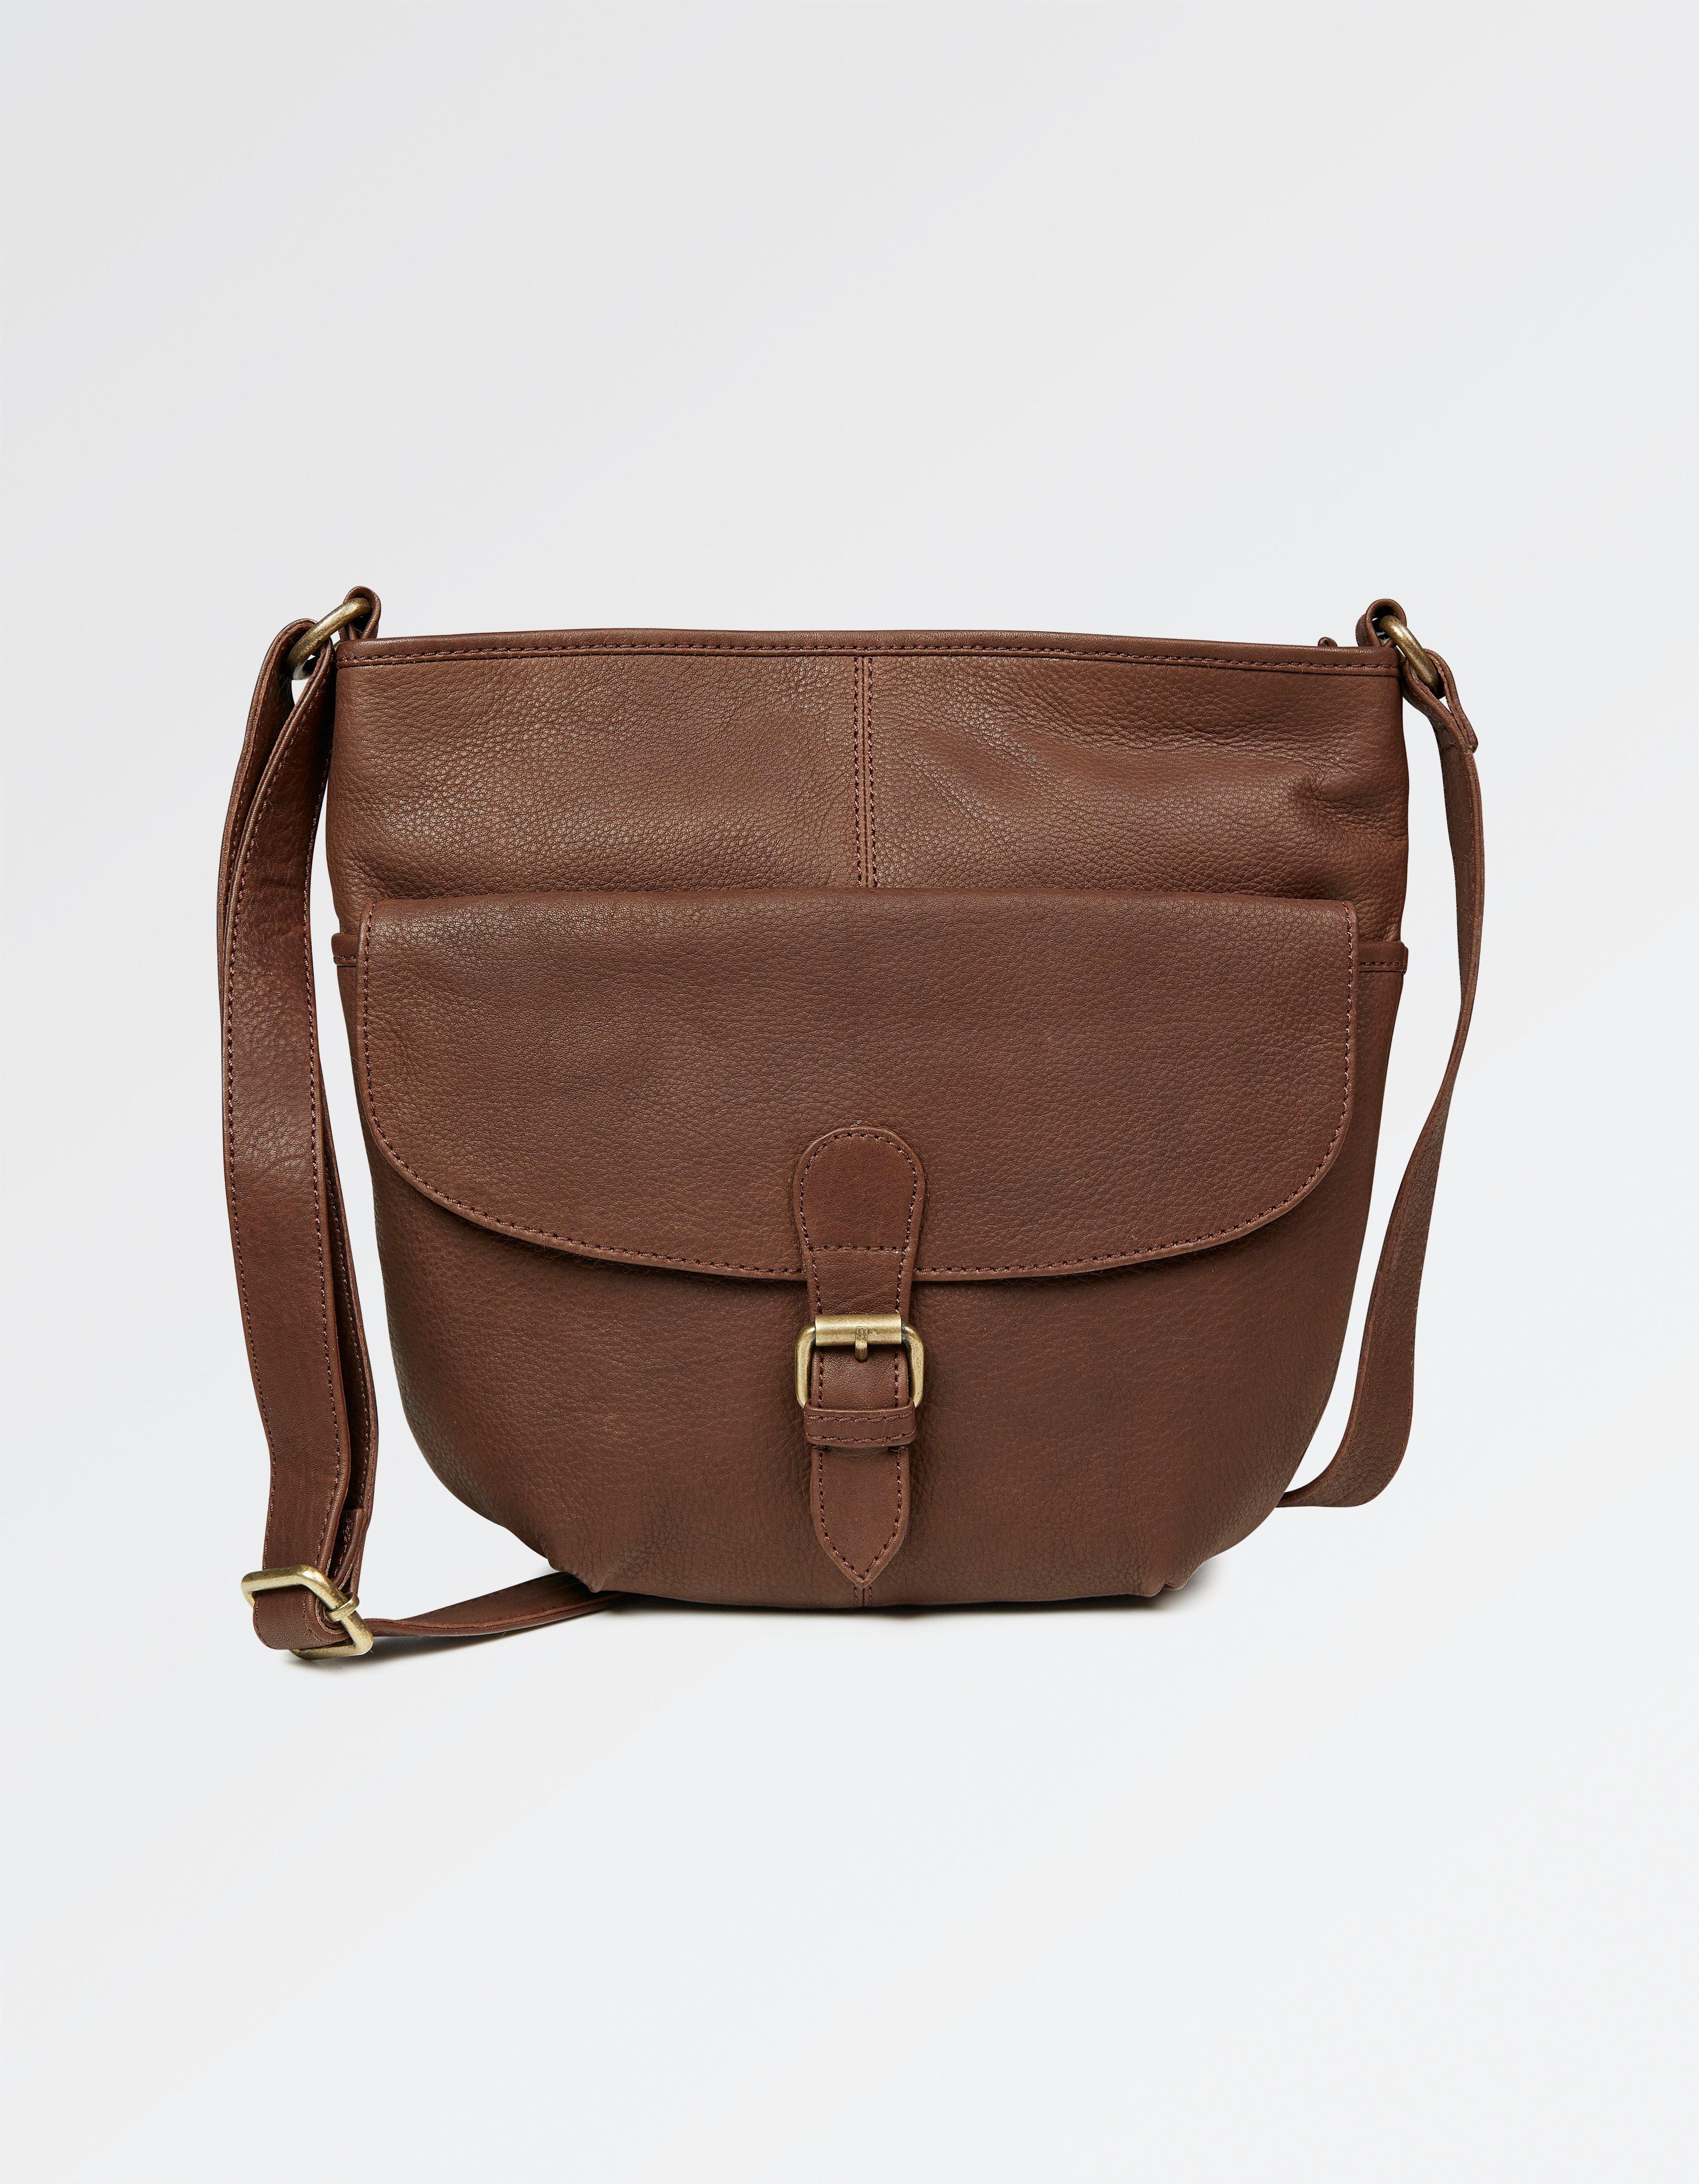 430539f8822 Leather Chocolate Cross Body Bag - FatFace Women's Bags